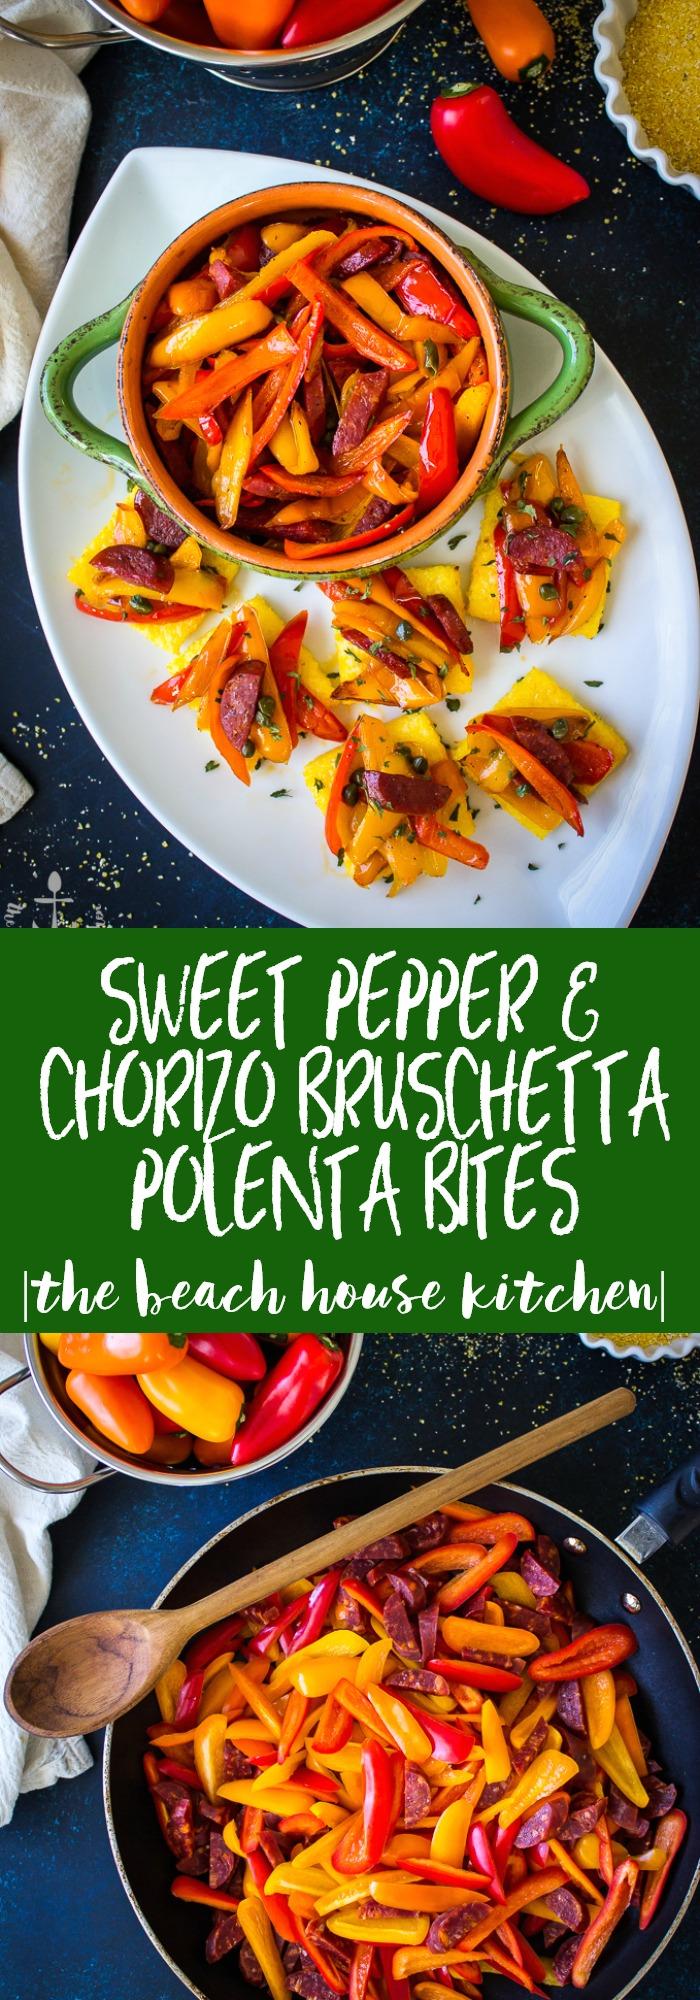 Sweet Pepper & Chorizo Bruschetta Polenta Bites